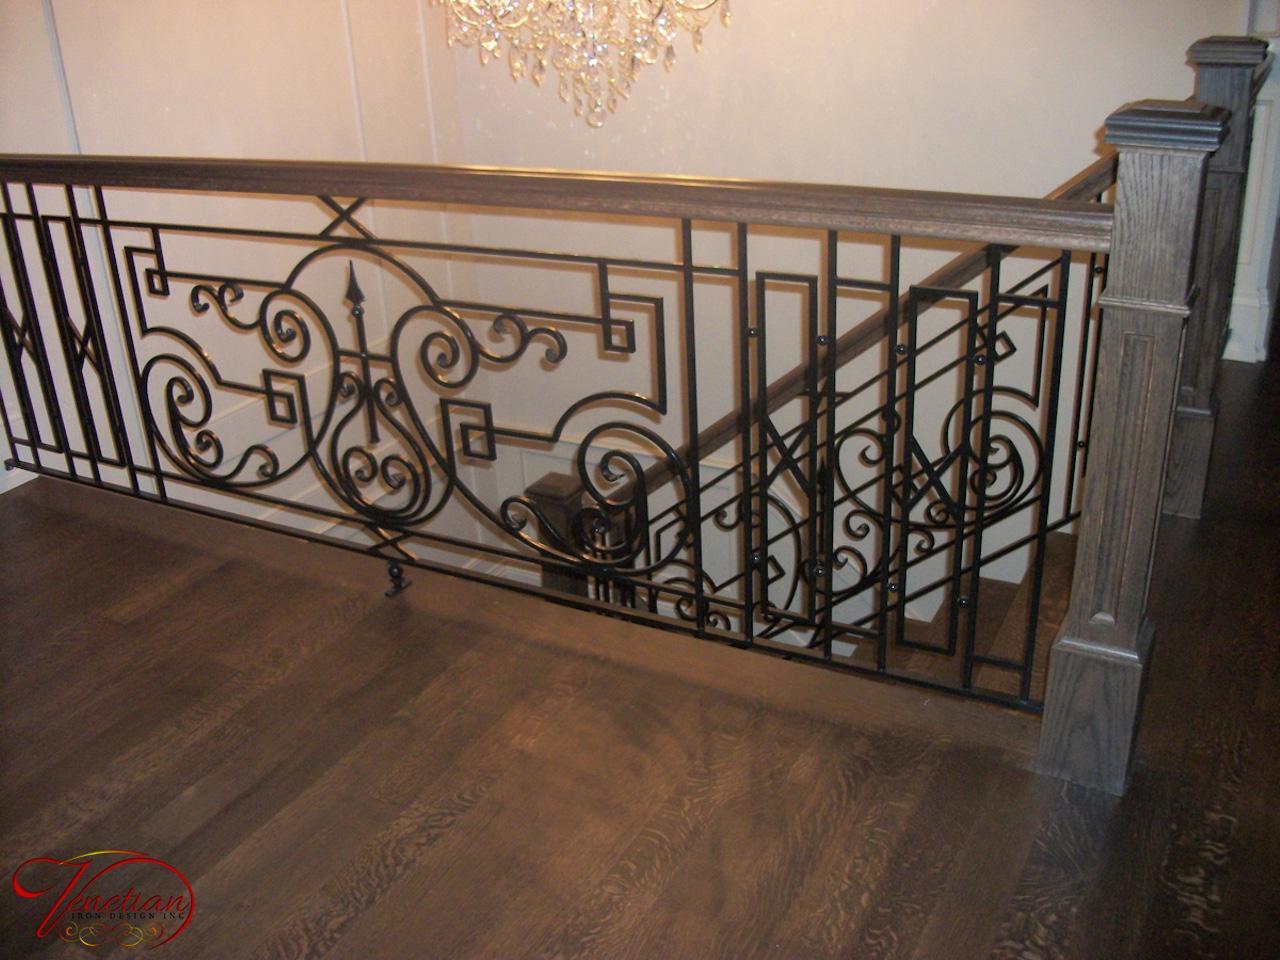 Wrought Iron Railings Interior Venetian Iron Designs Inc